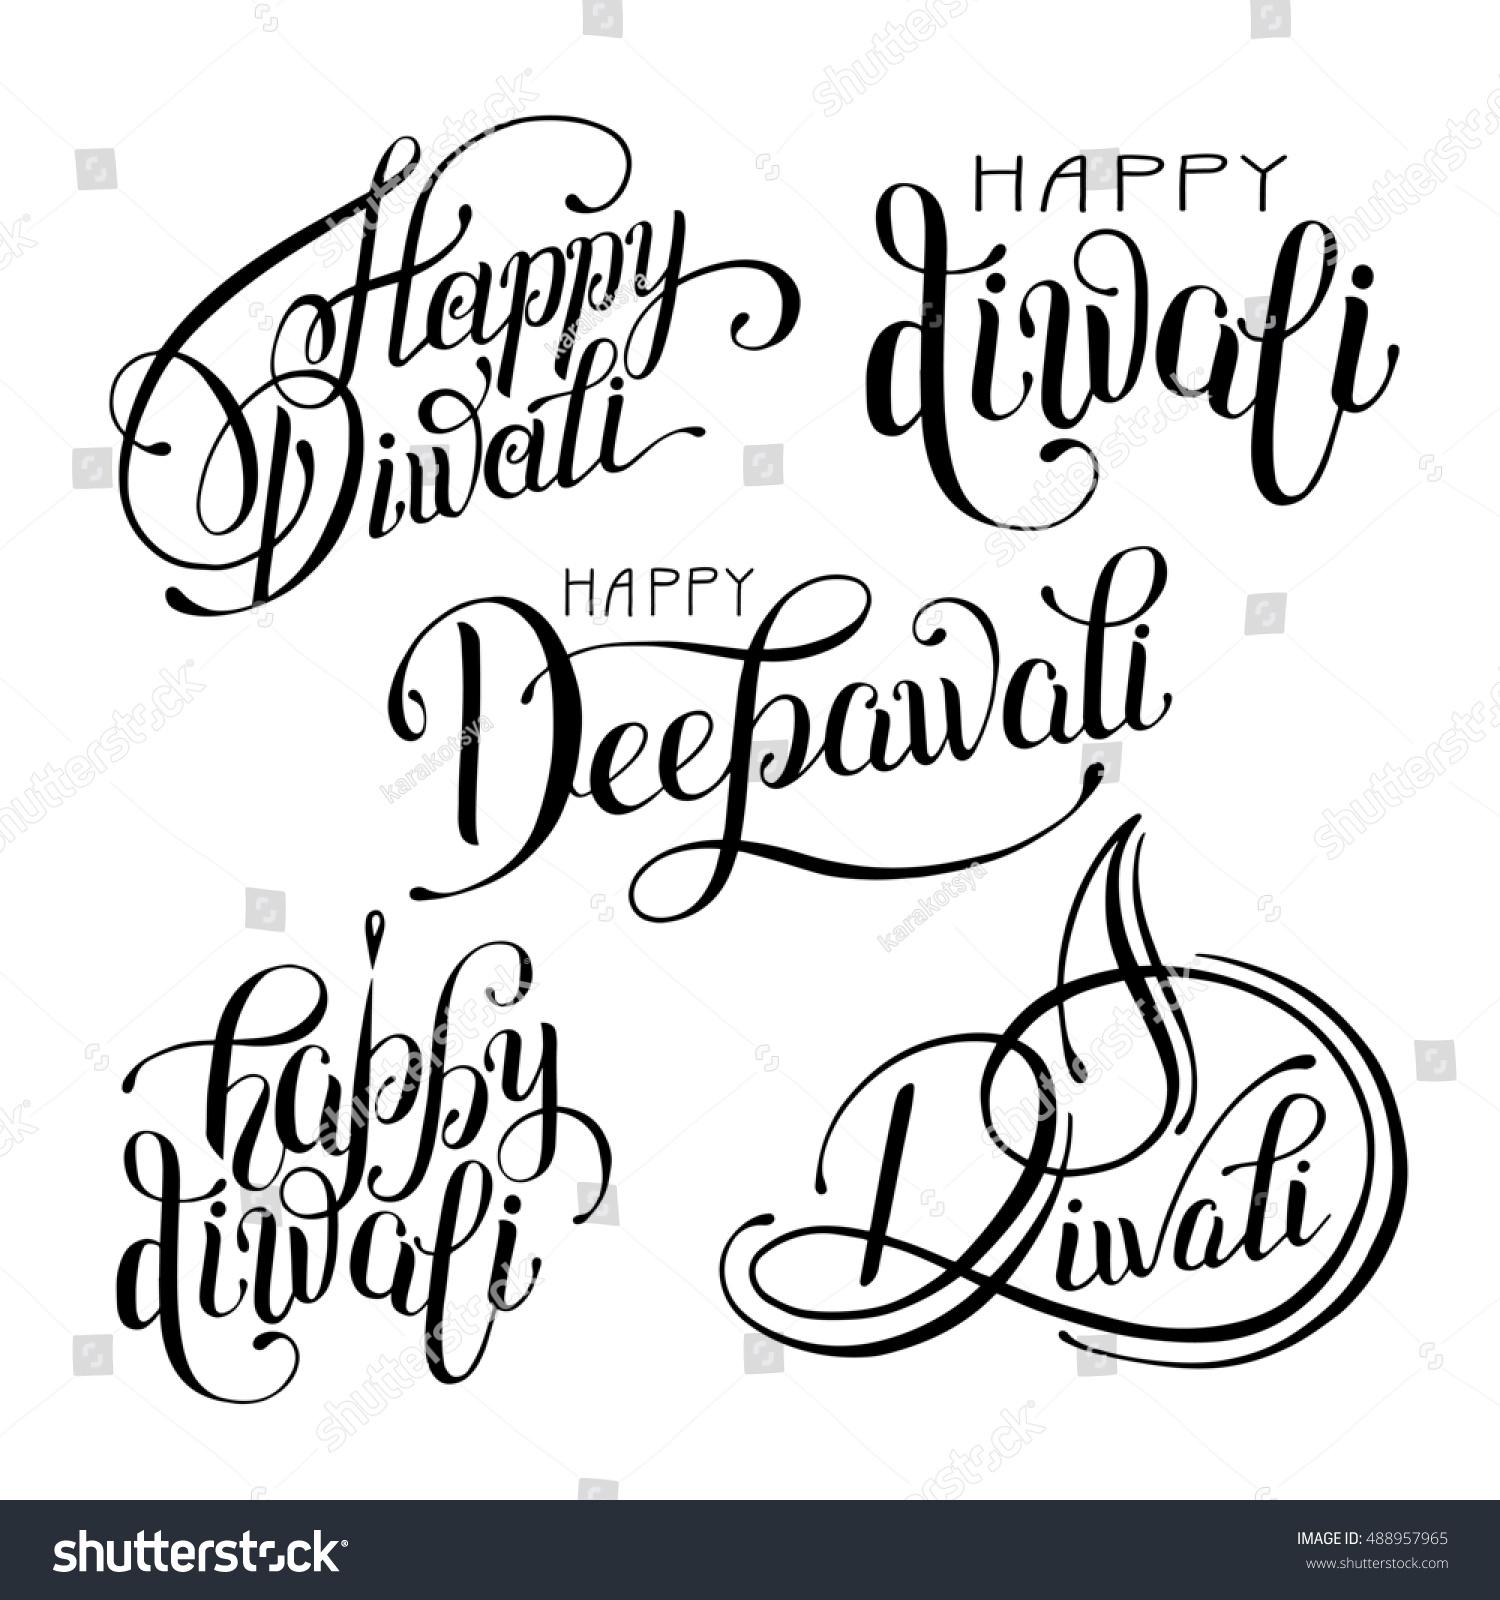 Set Black White Hand Drawing Design Stock Illustration 488957965 ... for diwali festival black and white images  61obs